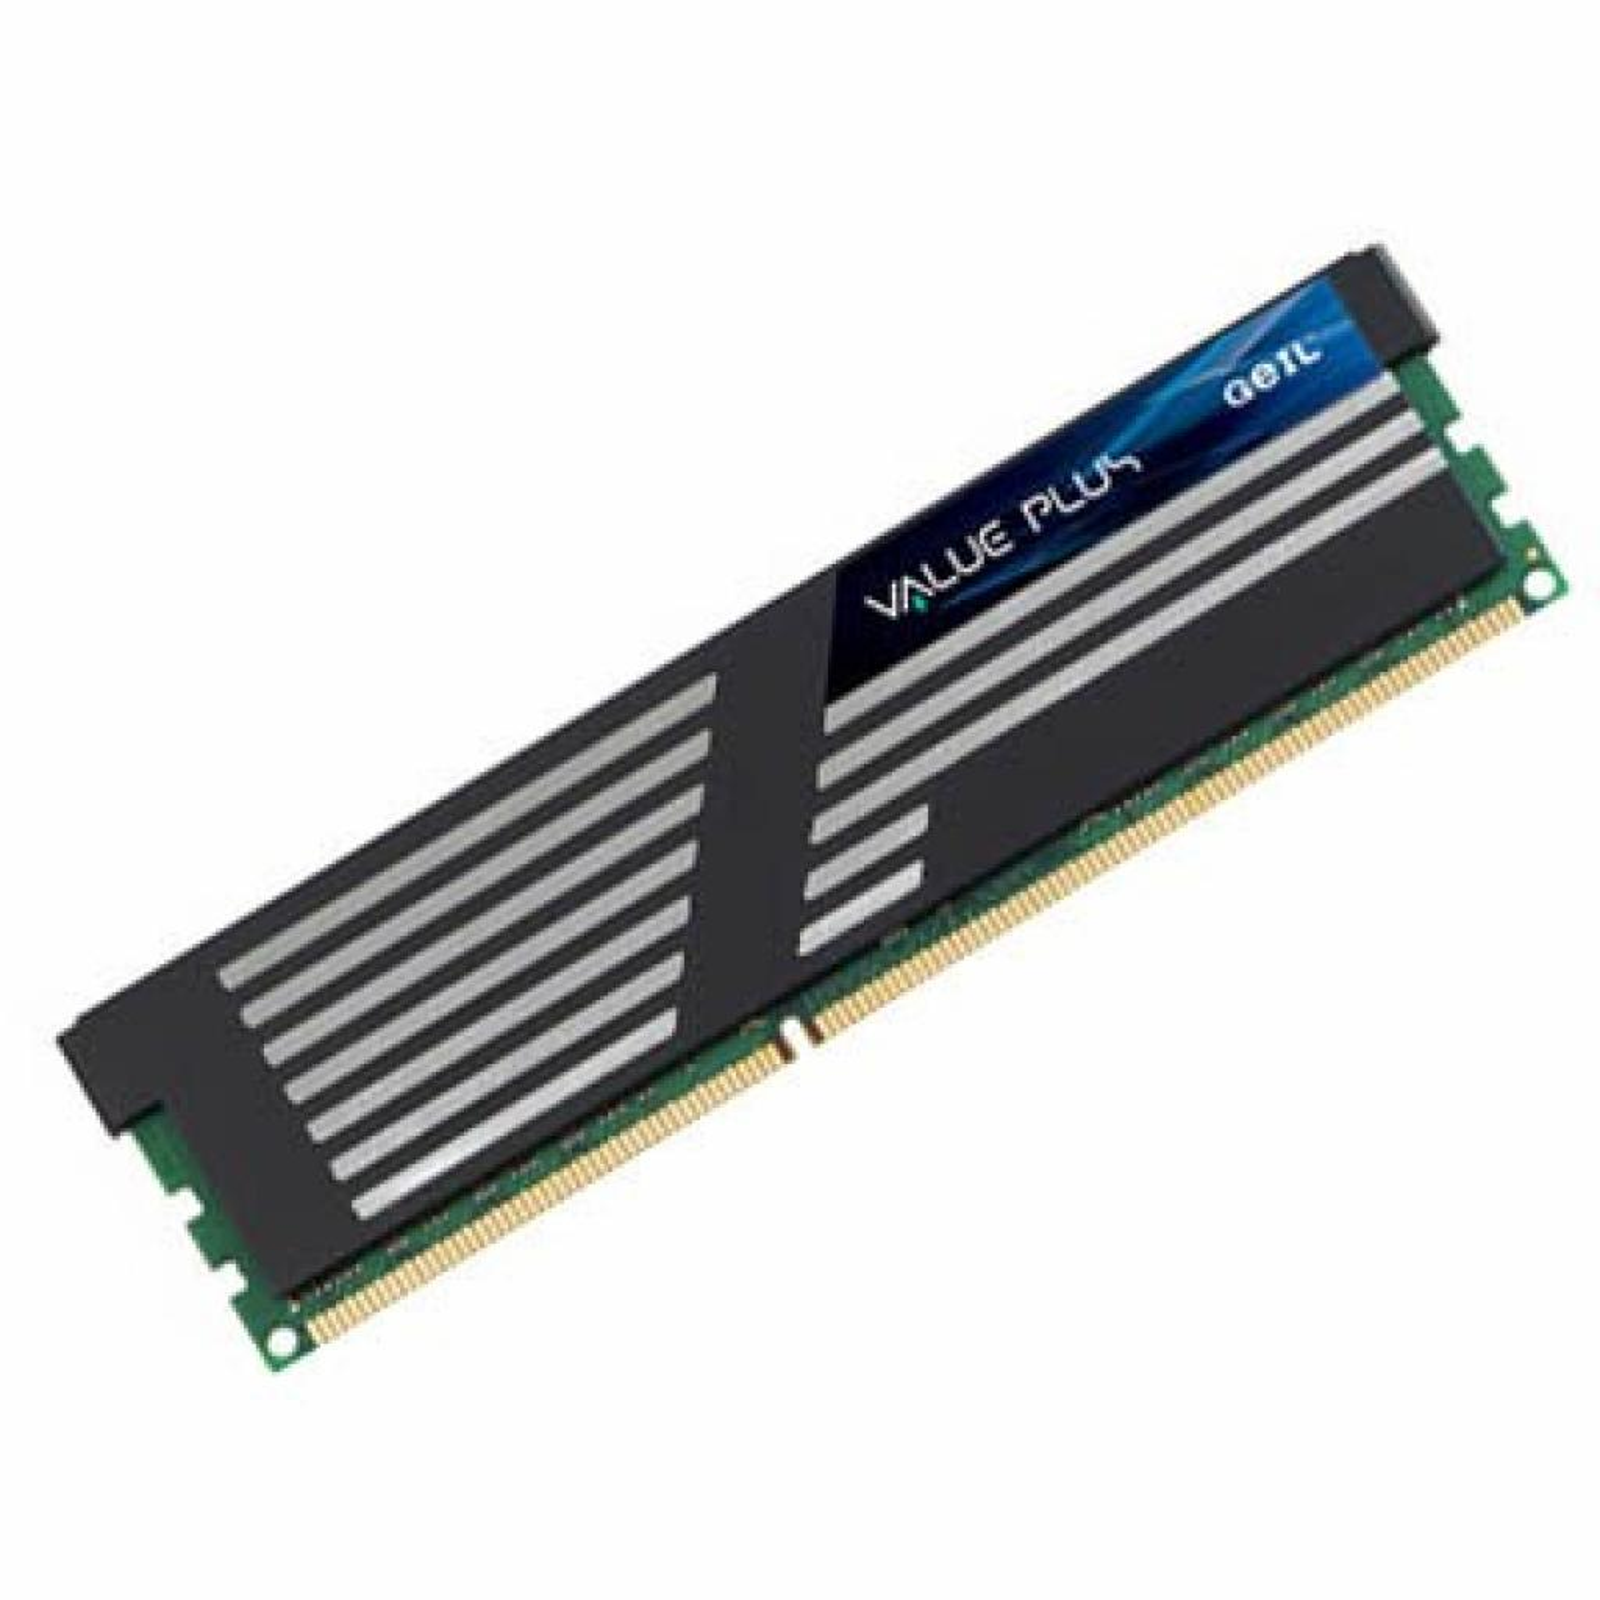 Модуль памяти для компьютера DDR3 4GB 1333 MHz GEIL (GVP34GB1333C9SC)